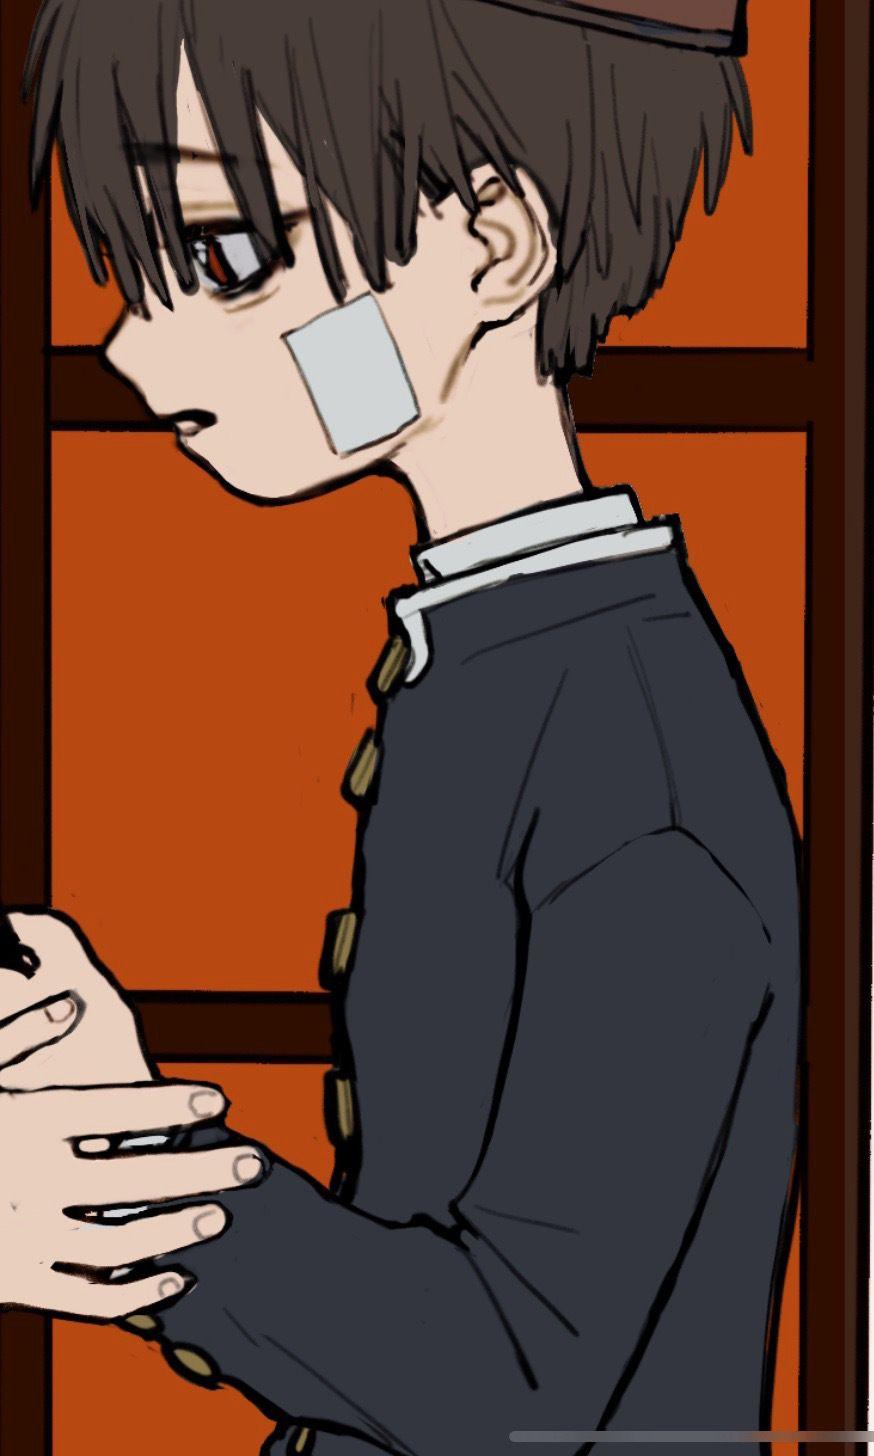 A normal student, i'd be with yashiro when she first visited hanako though. Ghim của Mochiiii trên Hanako trong 2020